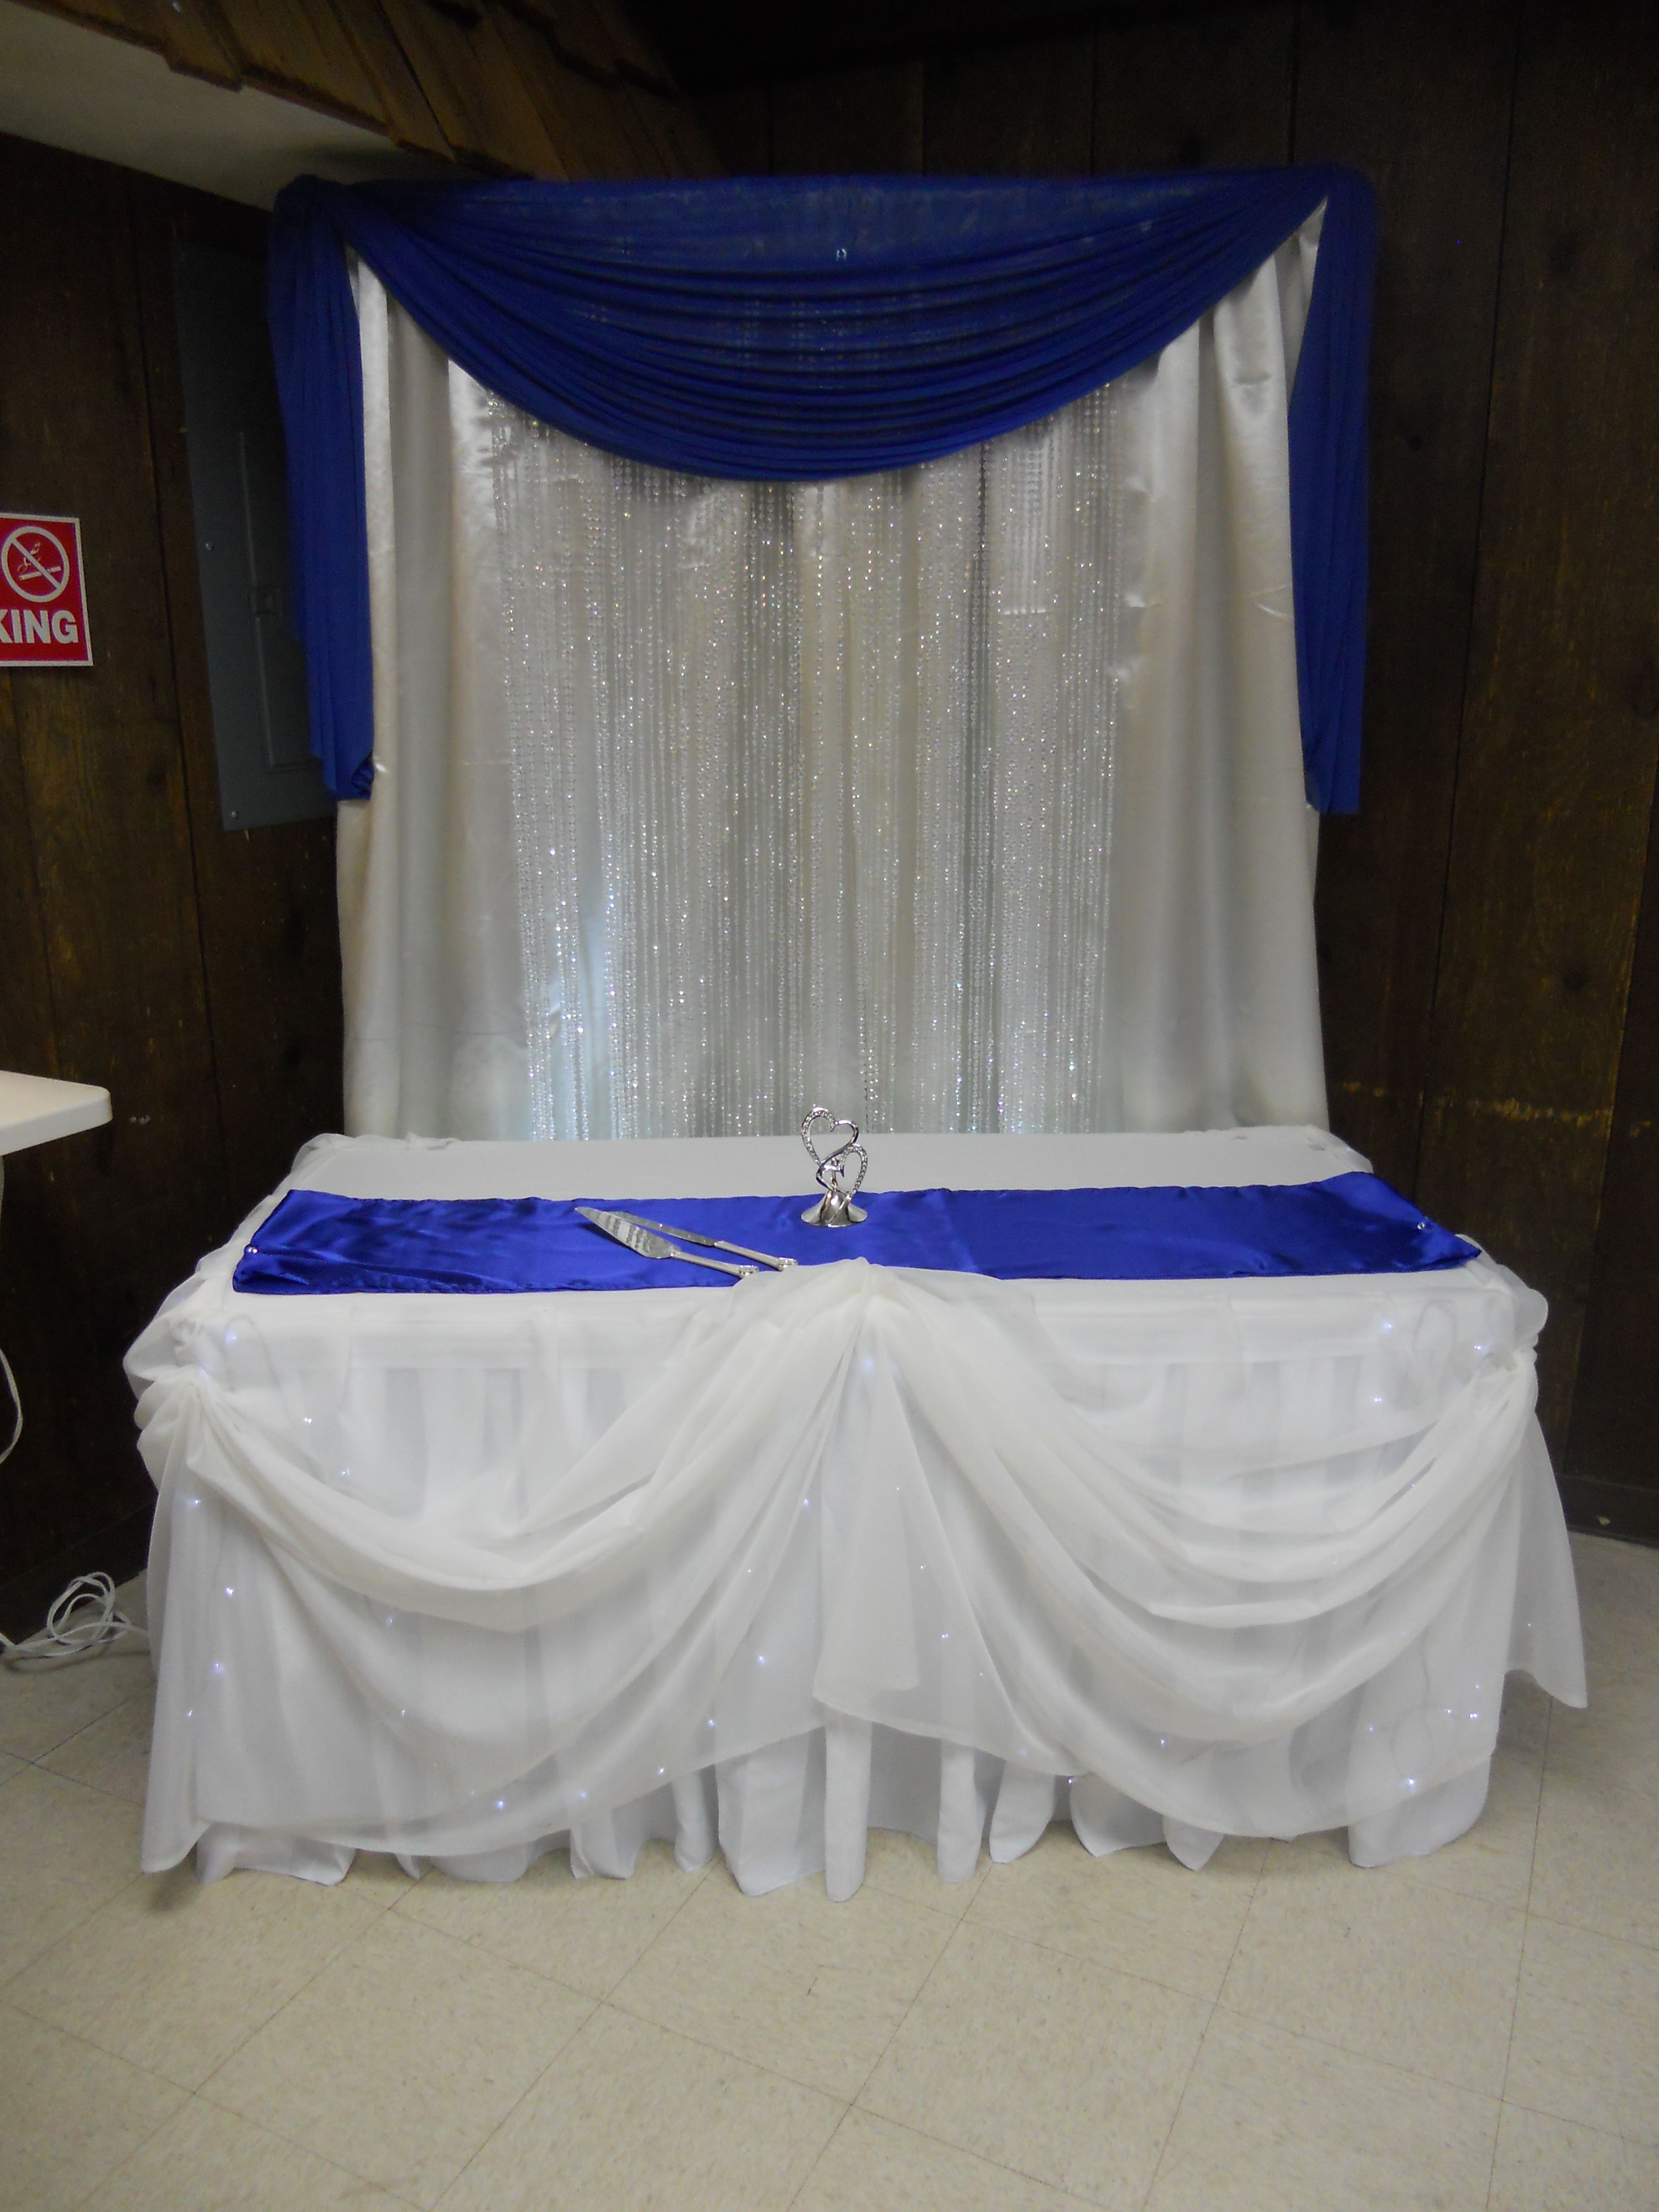 Cake Table Royal Blue Royal Blue Wedding Theme Wedding Cake